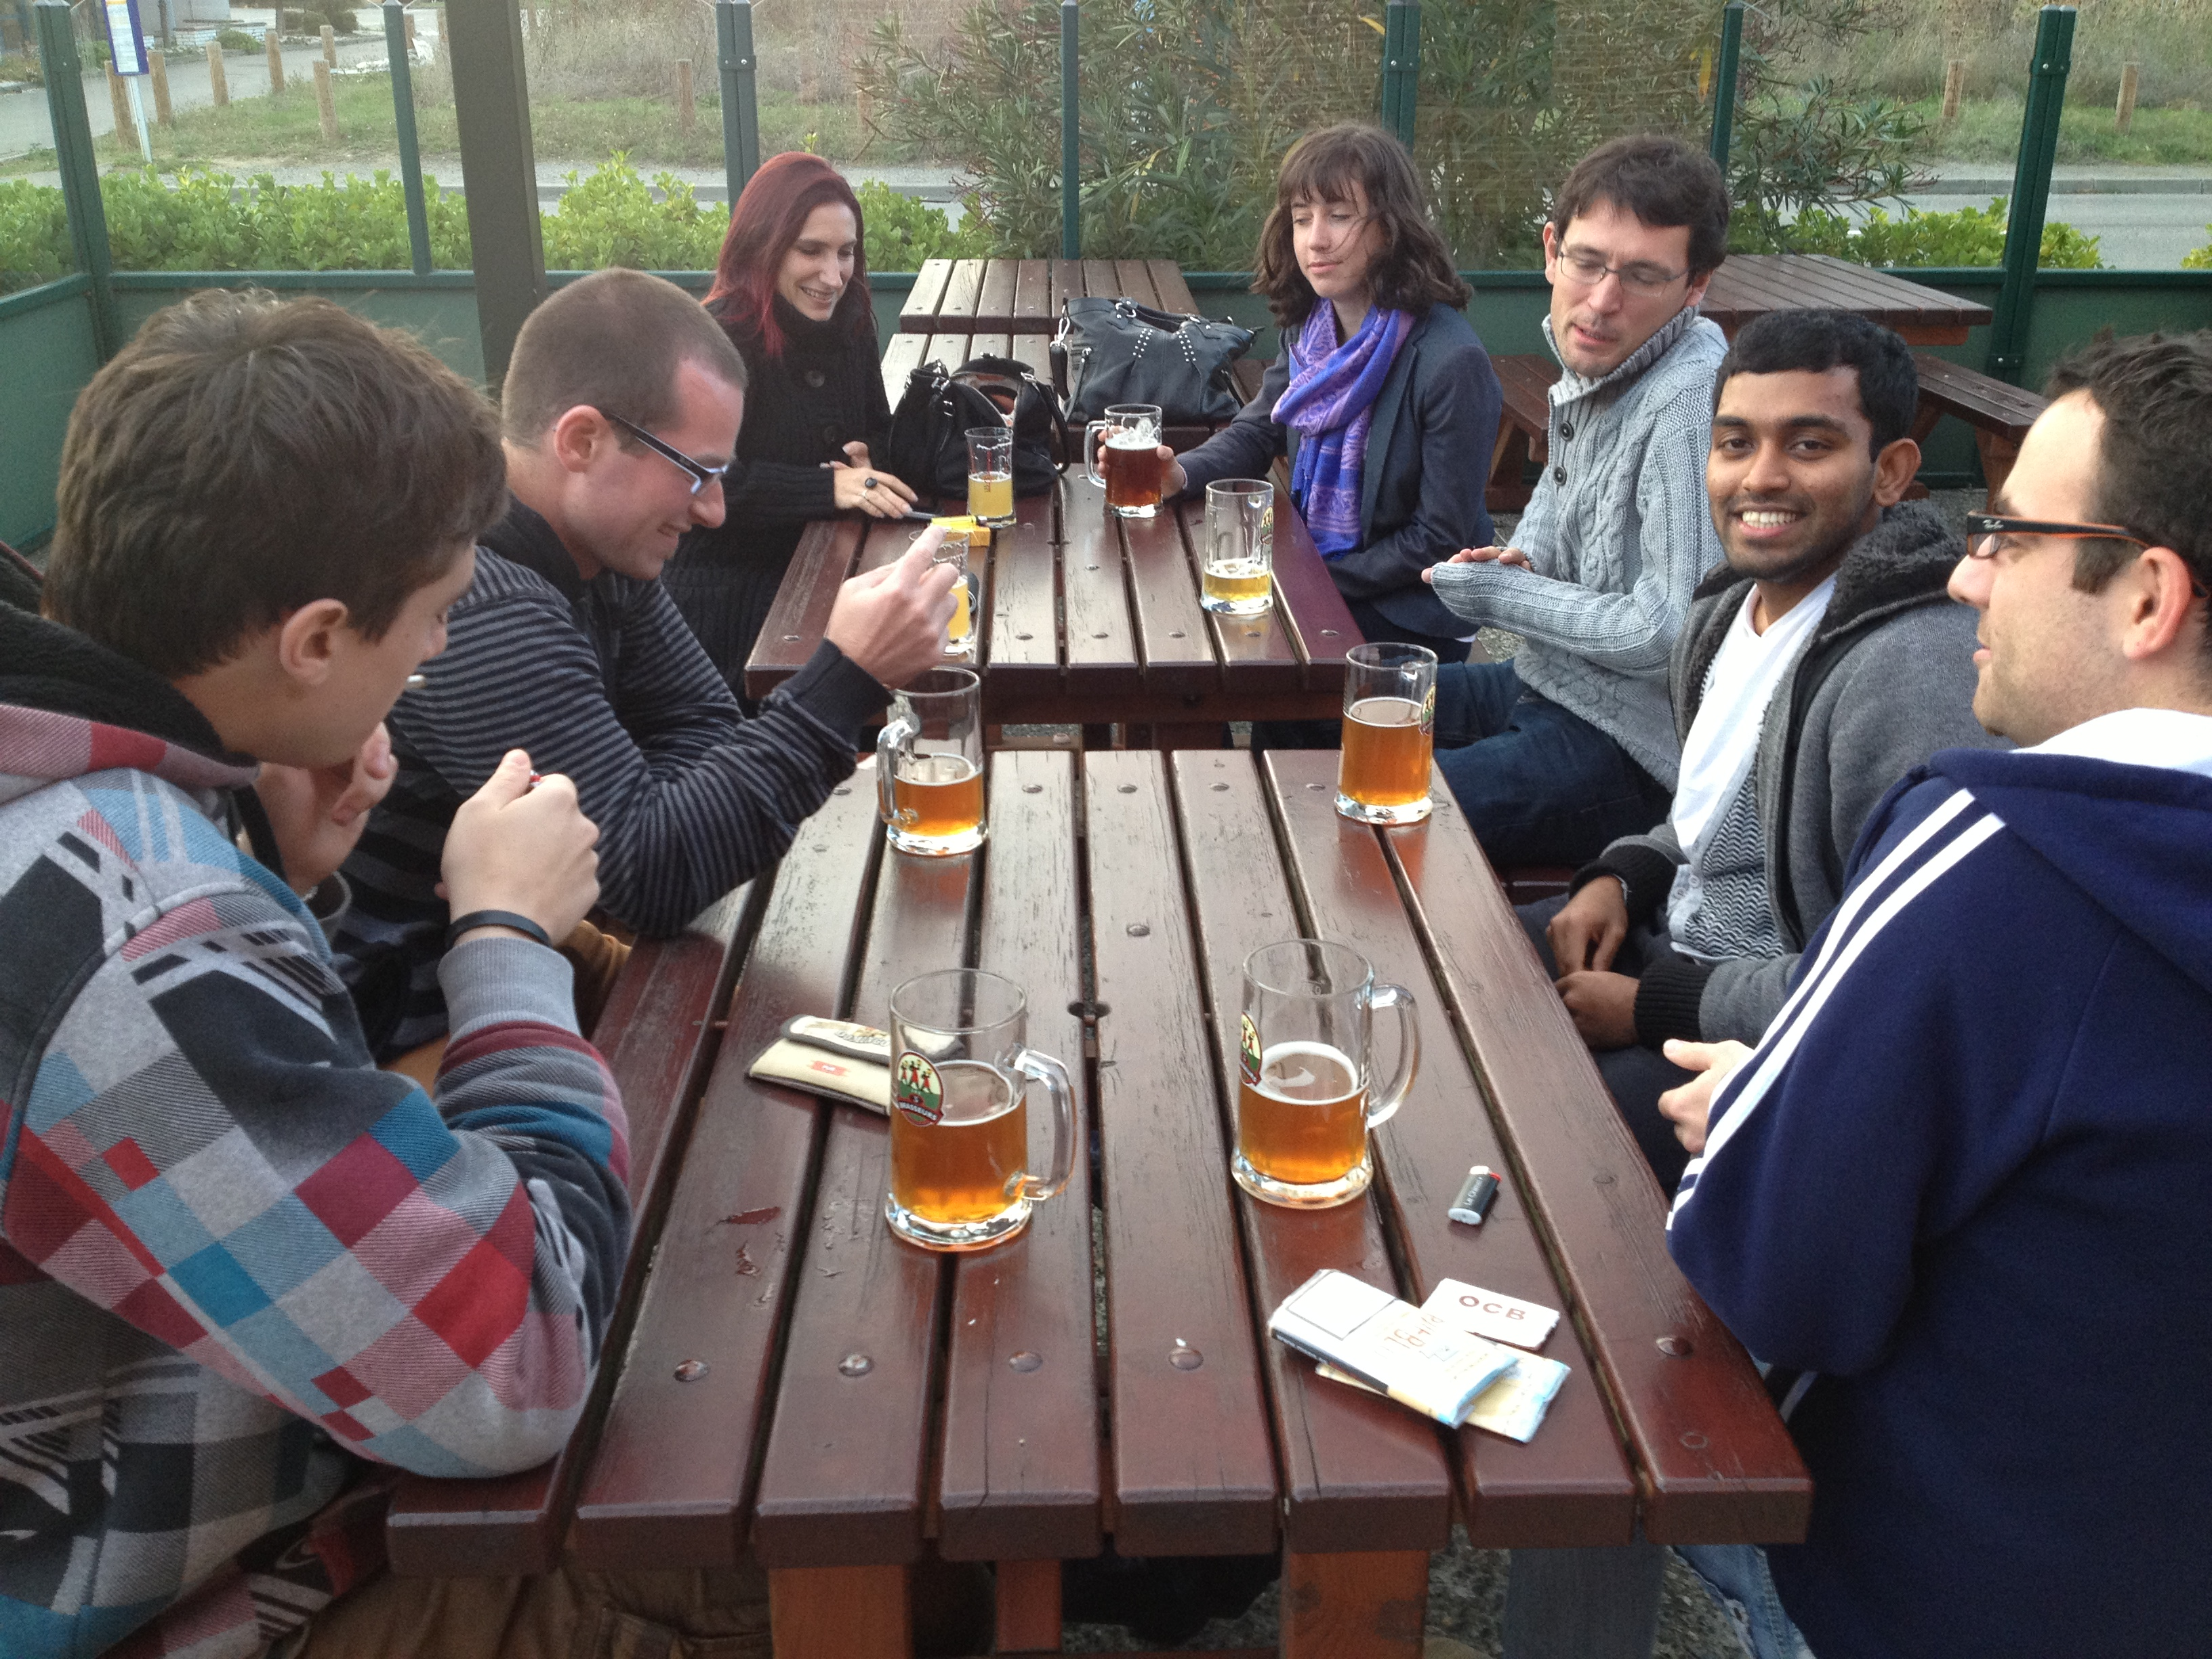 valiantys-team-beers